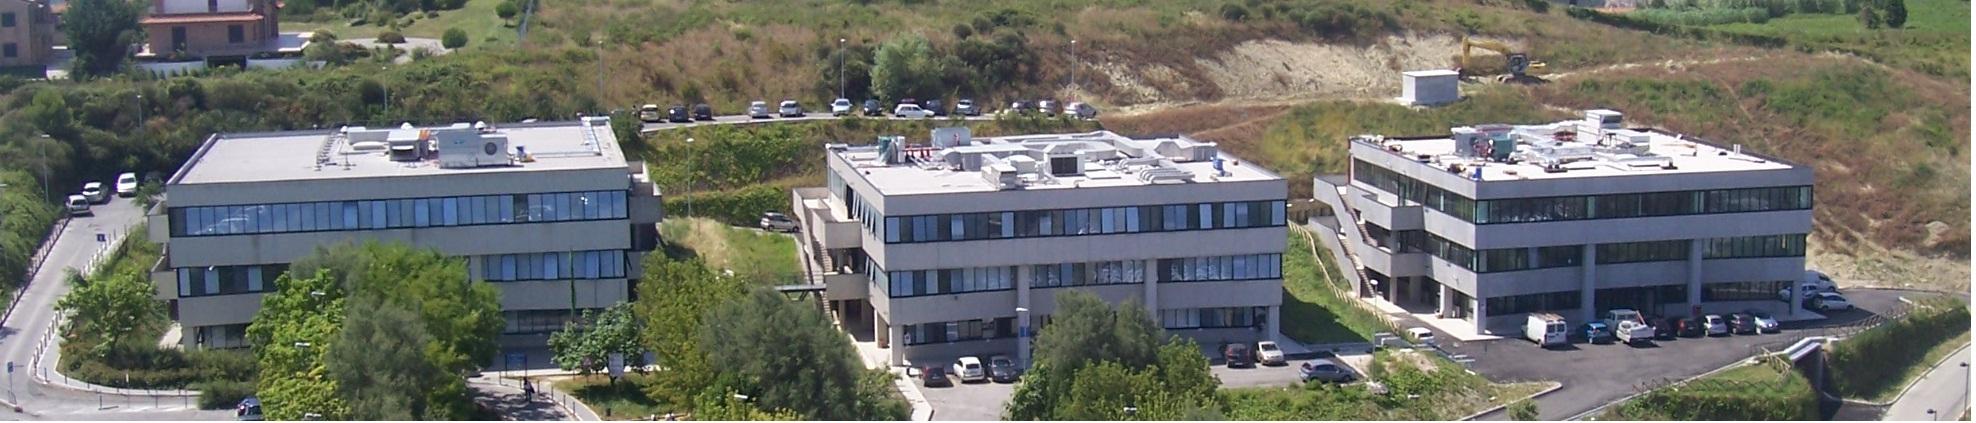 Le tre palazzine sede del Dipartimento